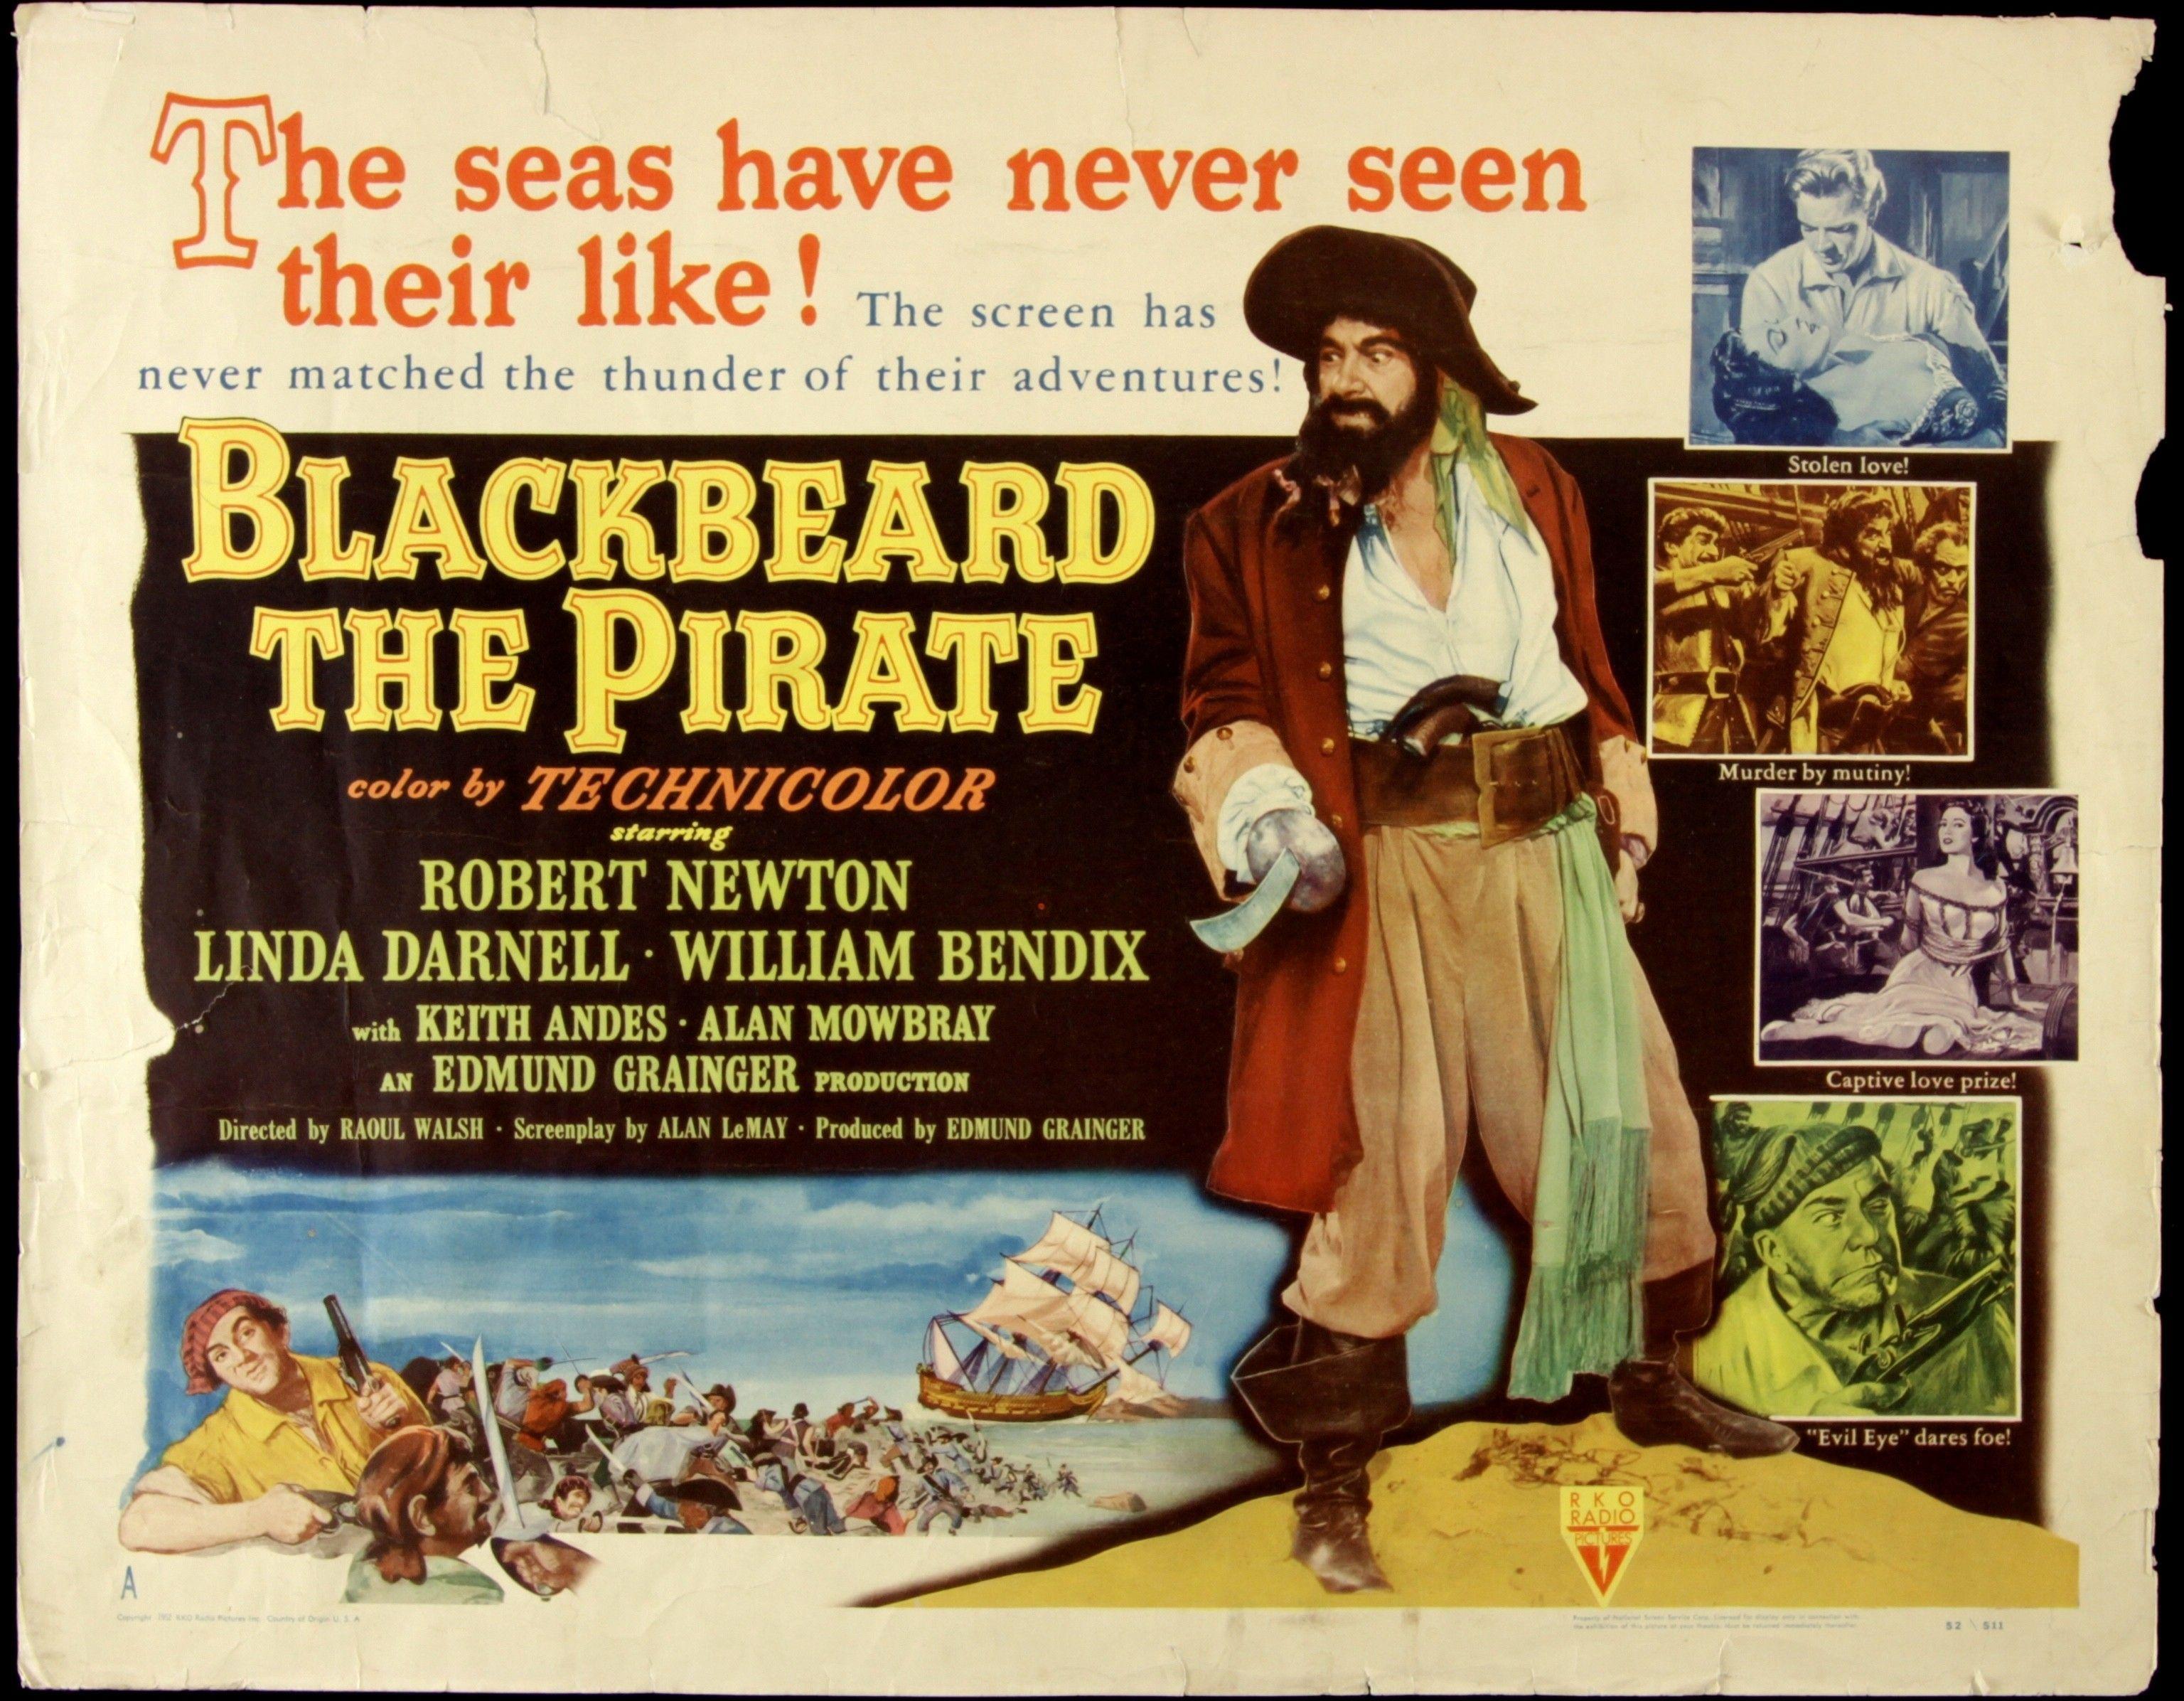 Blackbeard The Pirate 1952 Movie